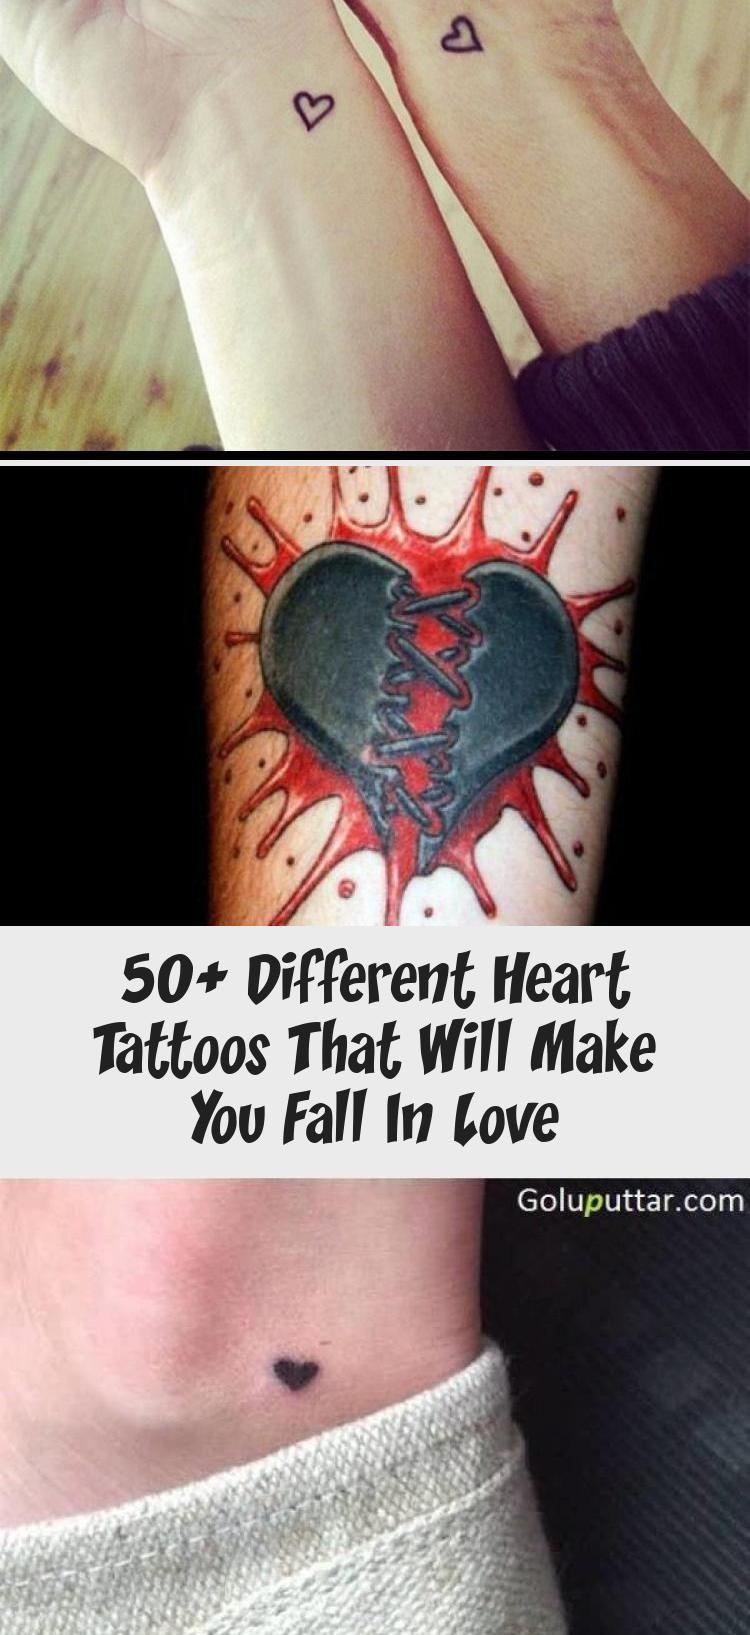 Celtic Heart Tattoo Hearttattoowithnames Hearttattooankle Hearttattoowithinitials Hearttattooneck Hear In 2020 Heart Tattoo Heart Tattoo Ankle Celtic Heart Tattoo